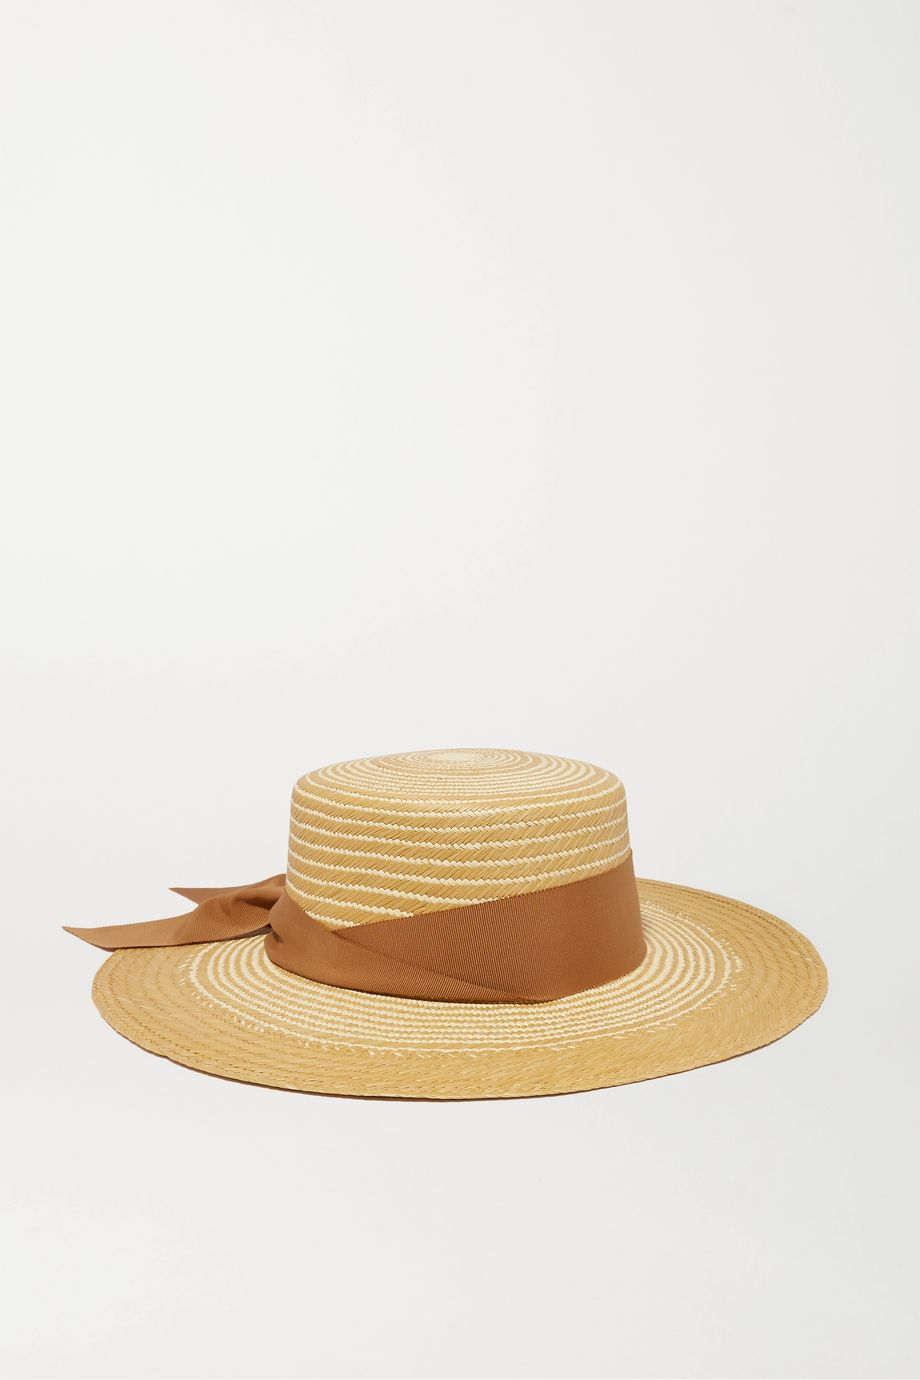 Sensi Studio Cordovez grosgrain-trimmed two-tone toquilla straw hat